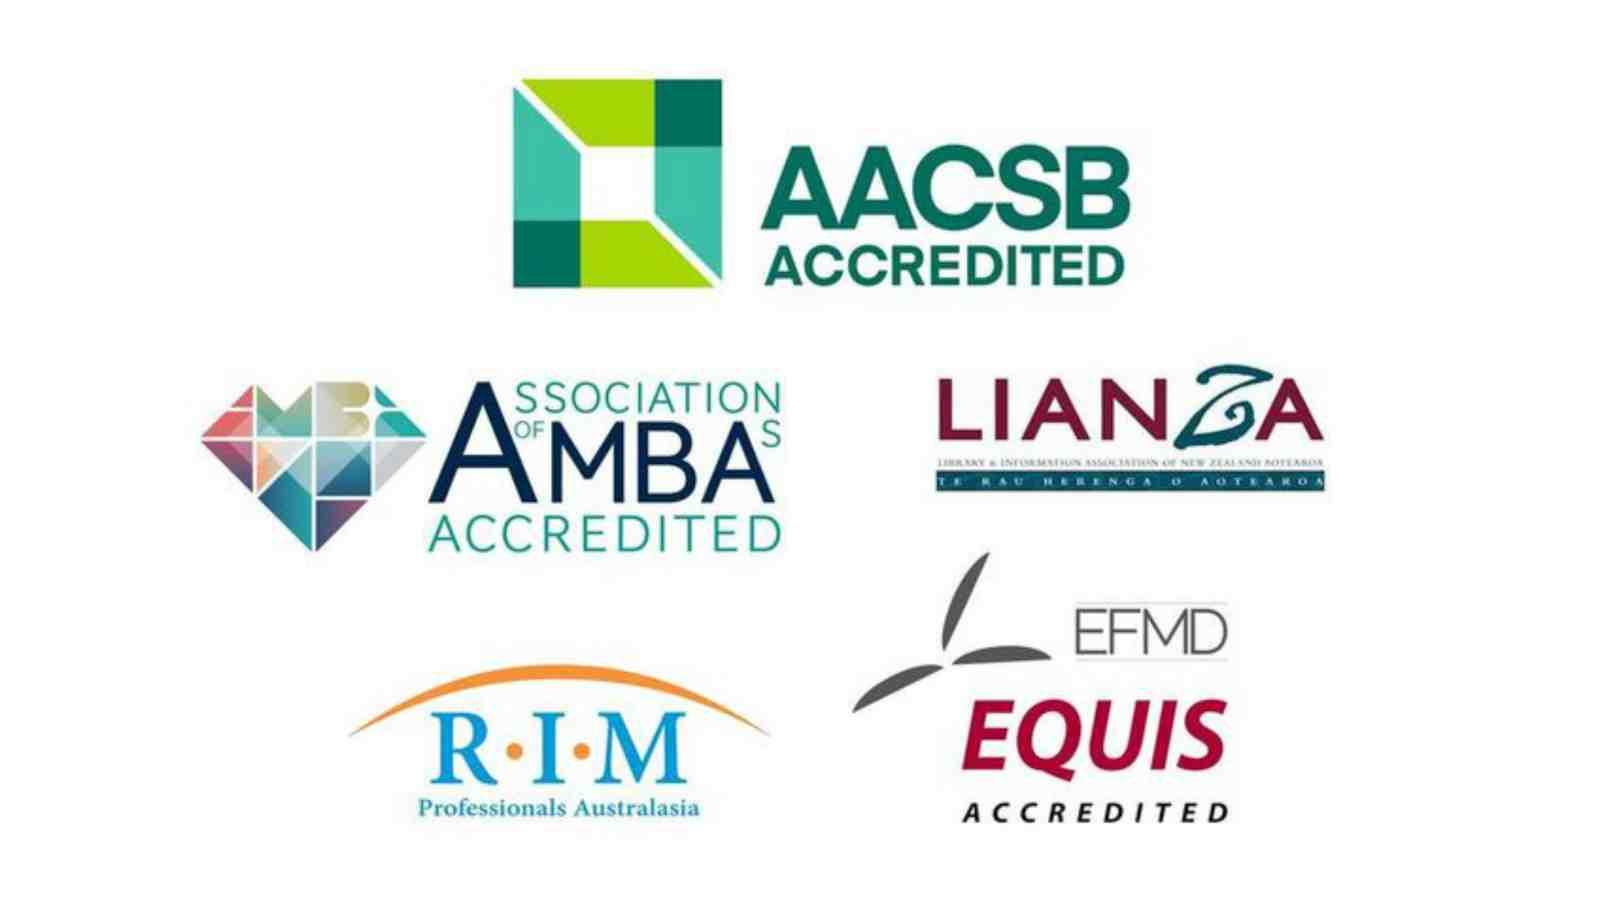 A colleciton of logos. AACSB, AMBA, LIANZA, RIM, EFMD.